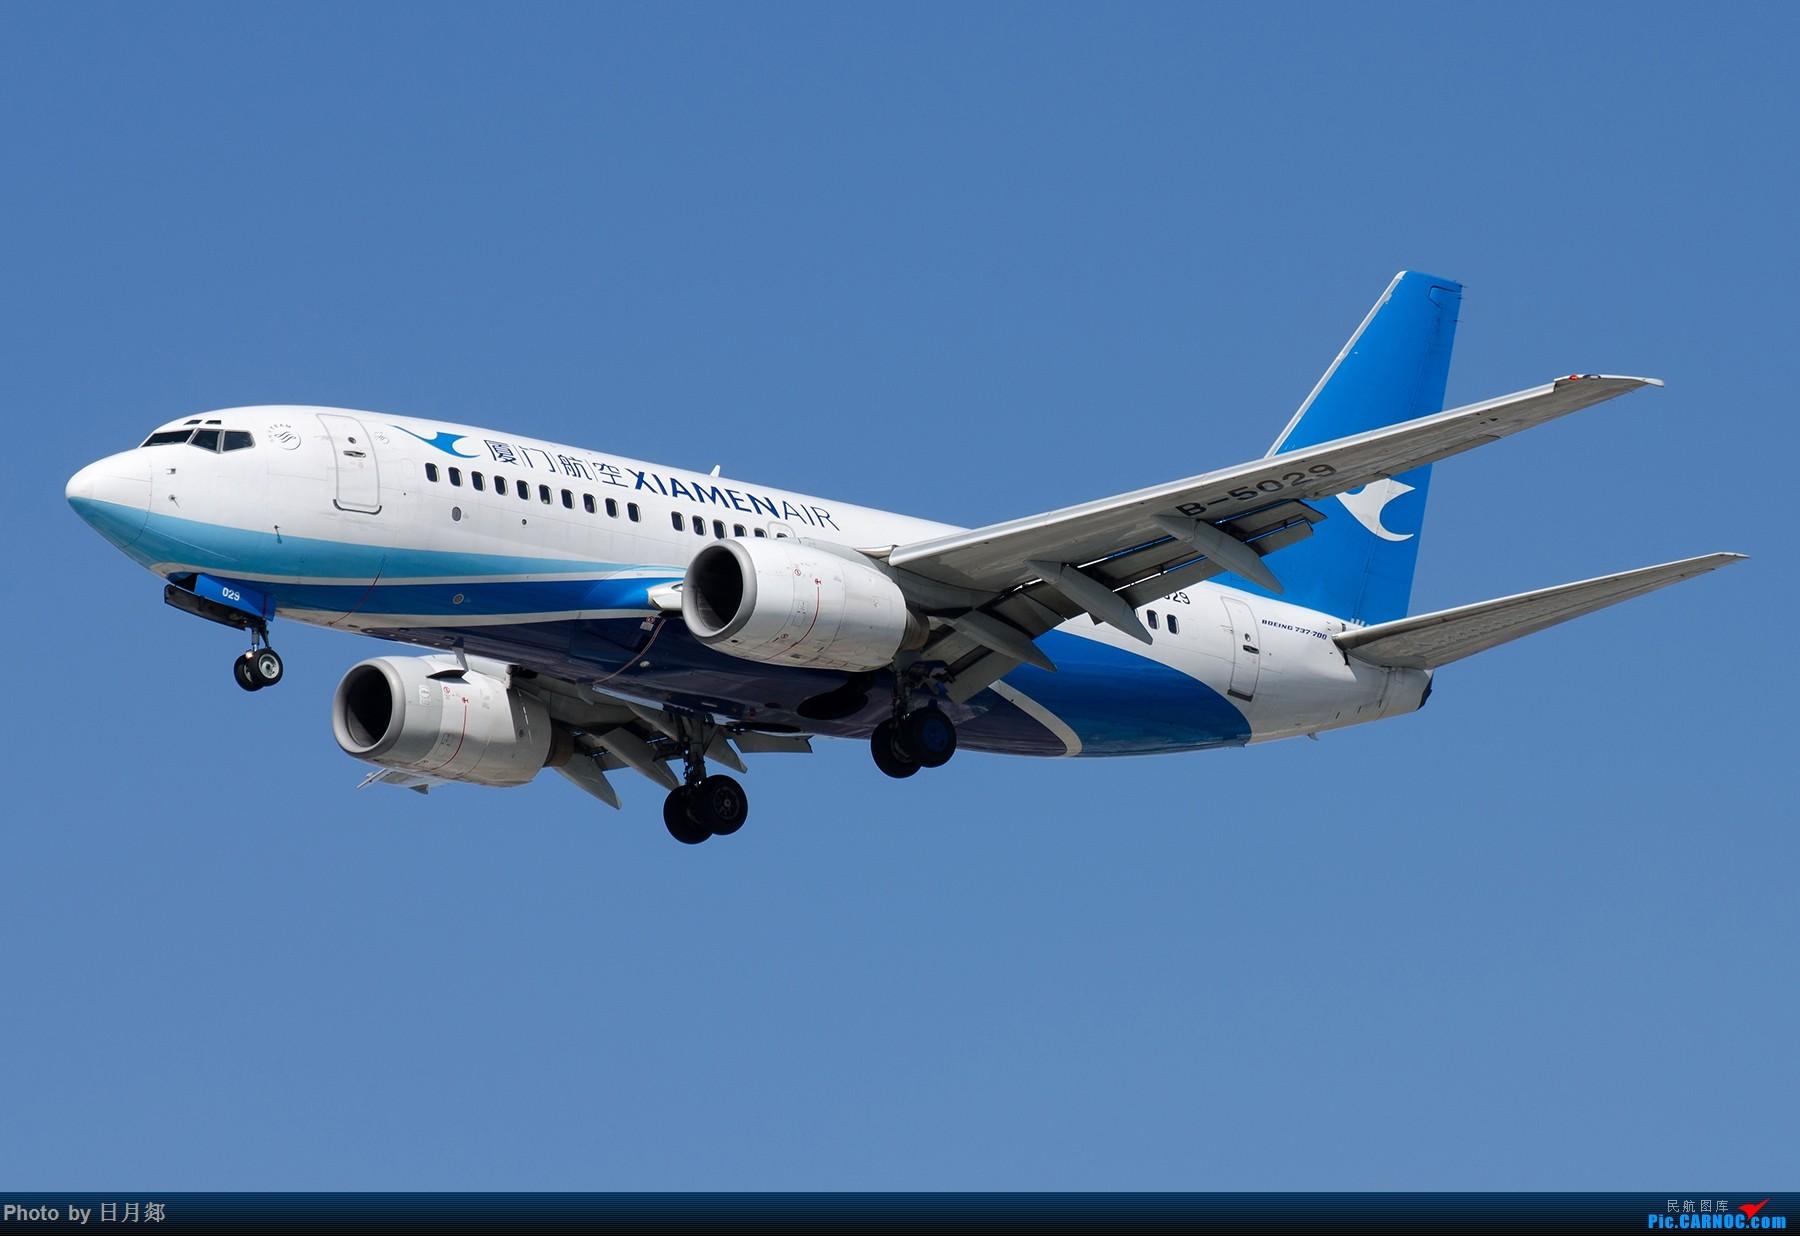 Re:[原创]【SHA拍机*1800大图】国庆的存货接着发,台风啥时候才能过去 BOEING 737-700 B-5029 中国上海虹桥国际机场